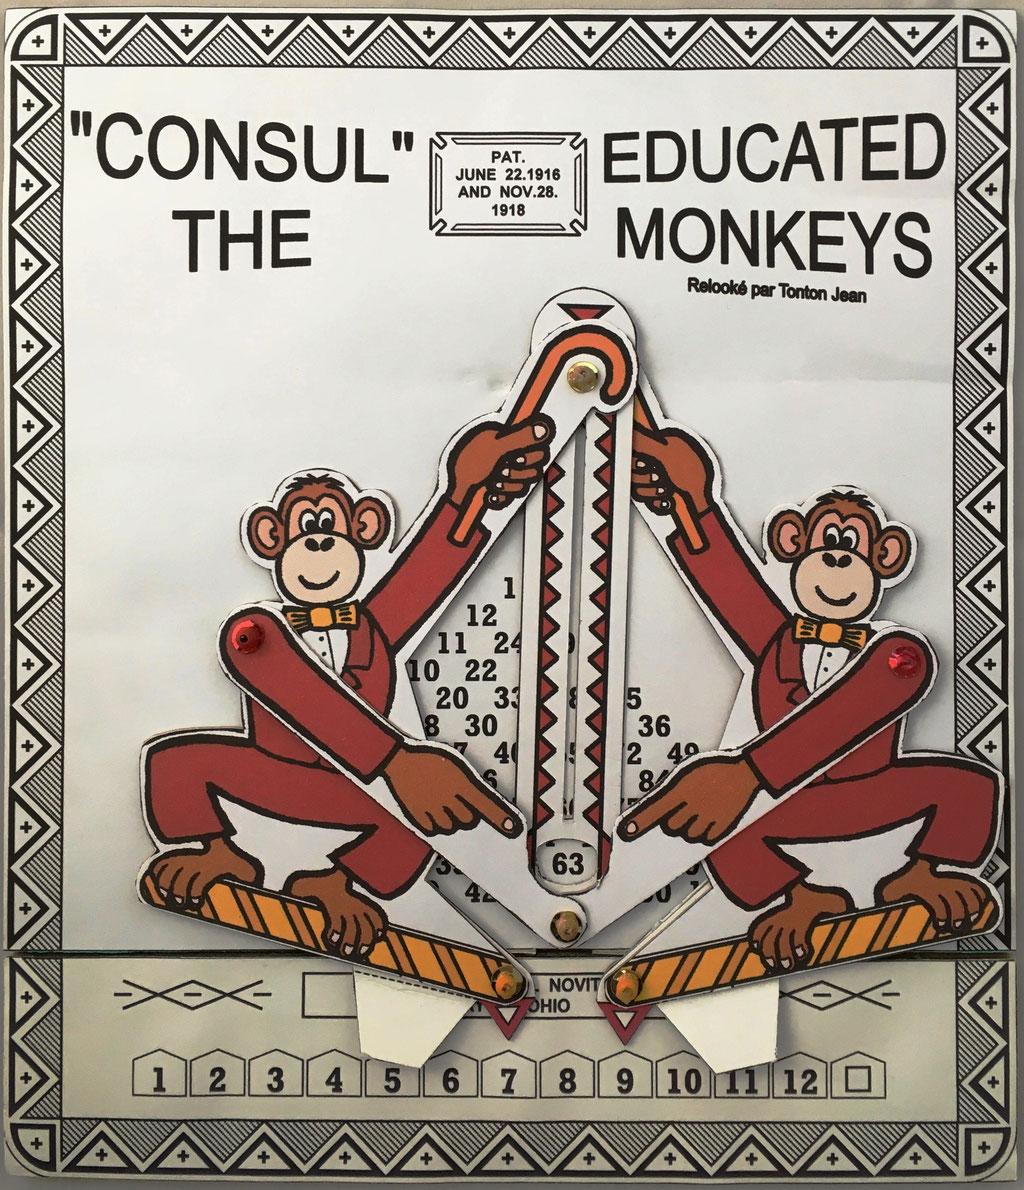 CONSUL The Educated Monkeys, versión francesa en cartón de CONSUL The Educated Monkey, fabricado por Tonton Jean (alias de Jean Beaubernard), Blanzy, Francia,  año 2011, 21x24 cm